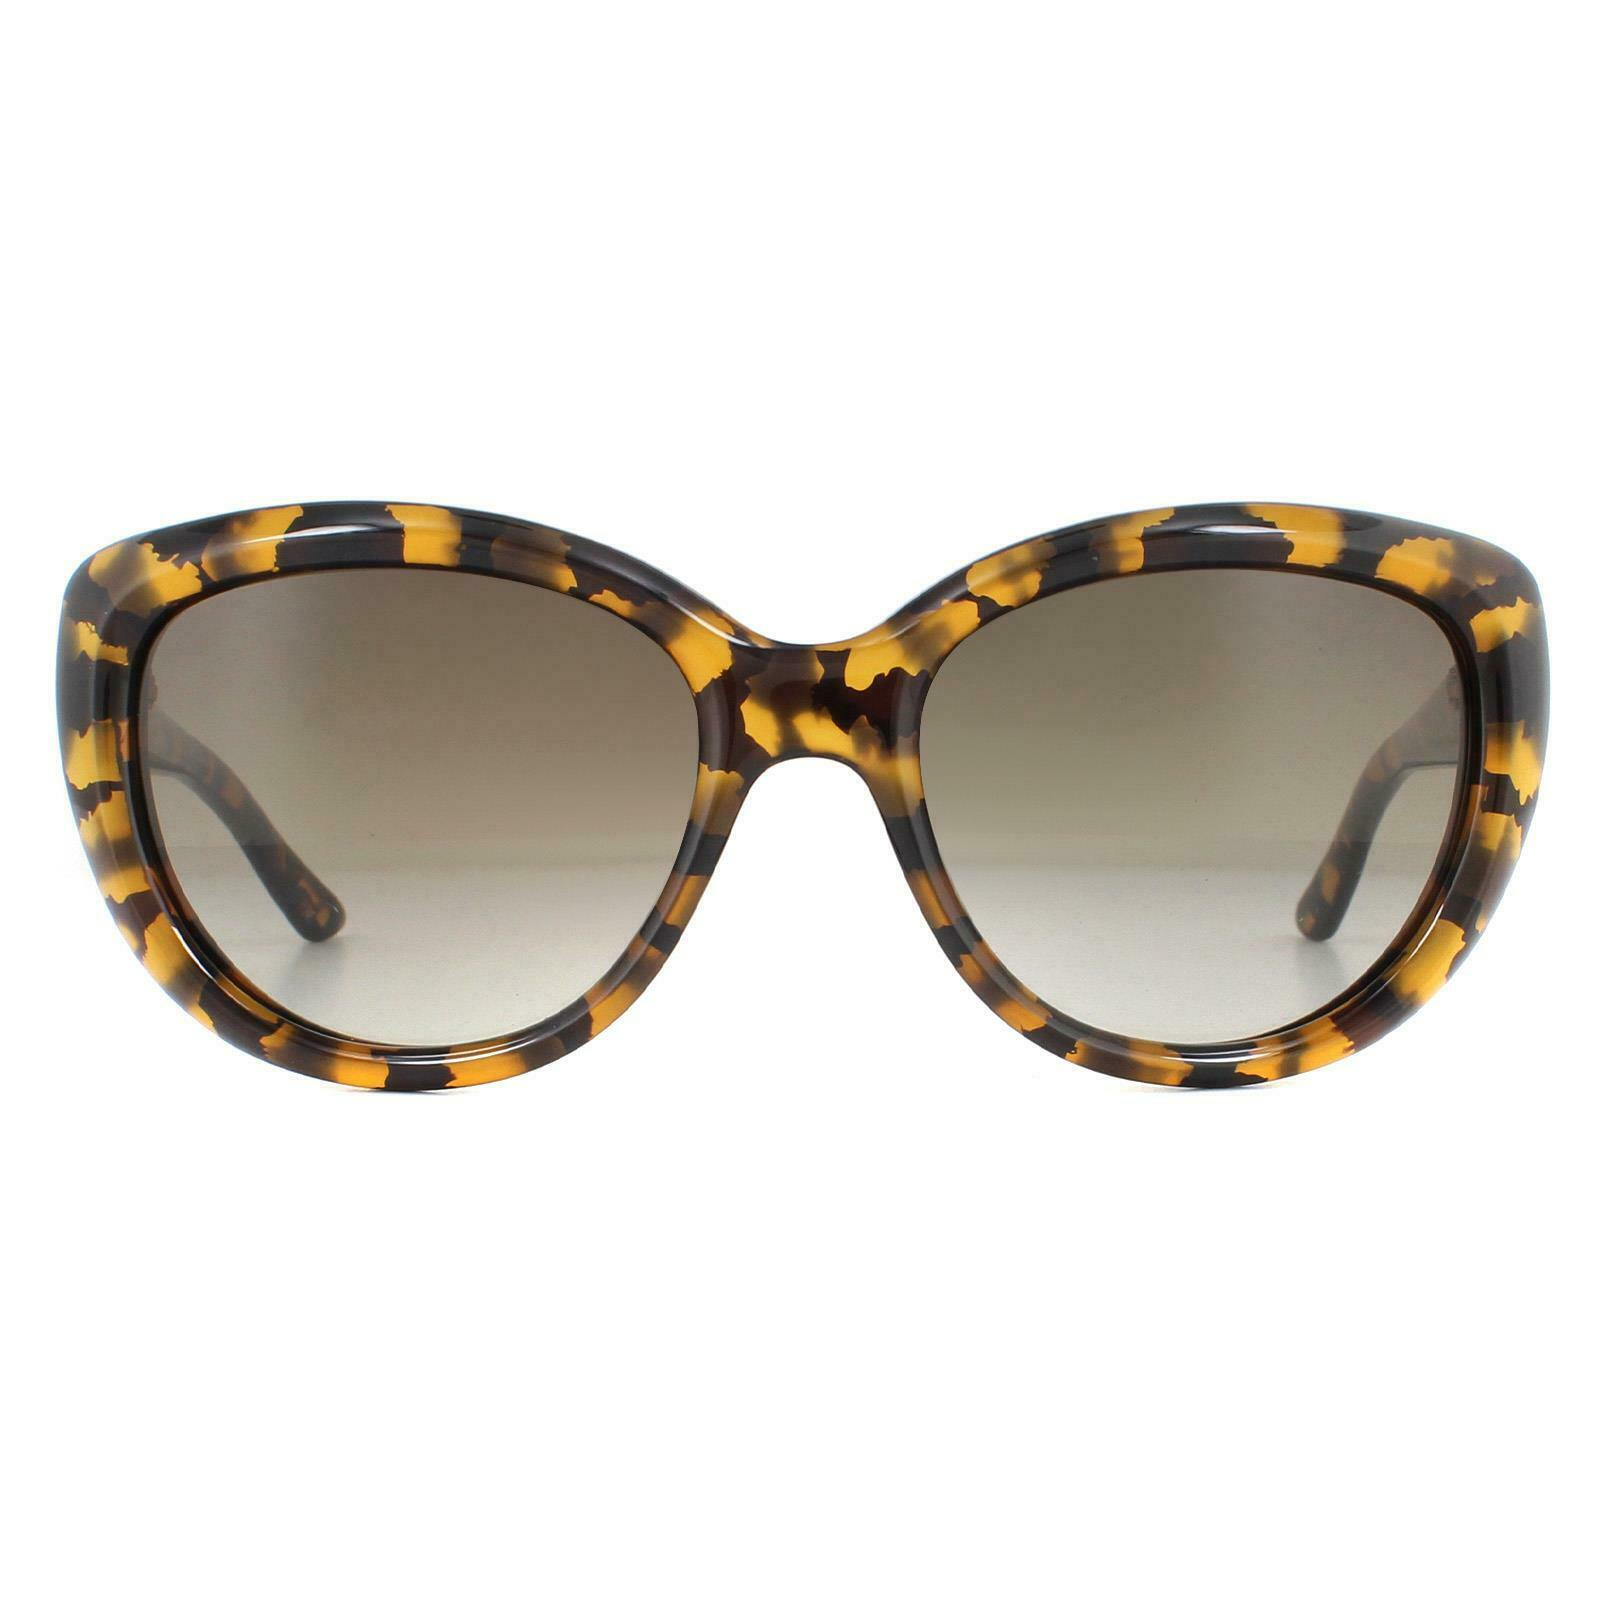 Dior Sunglasses Lady Cat 1 O5U HA Brown Tortoise Brown Gradient